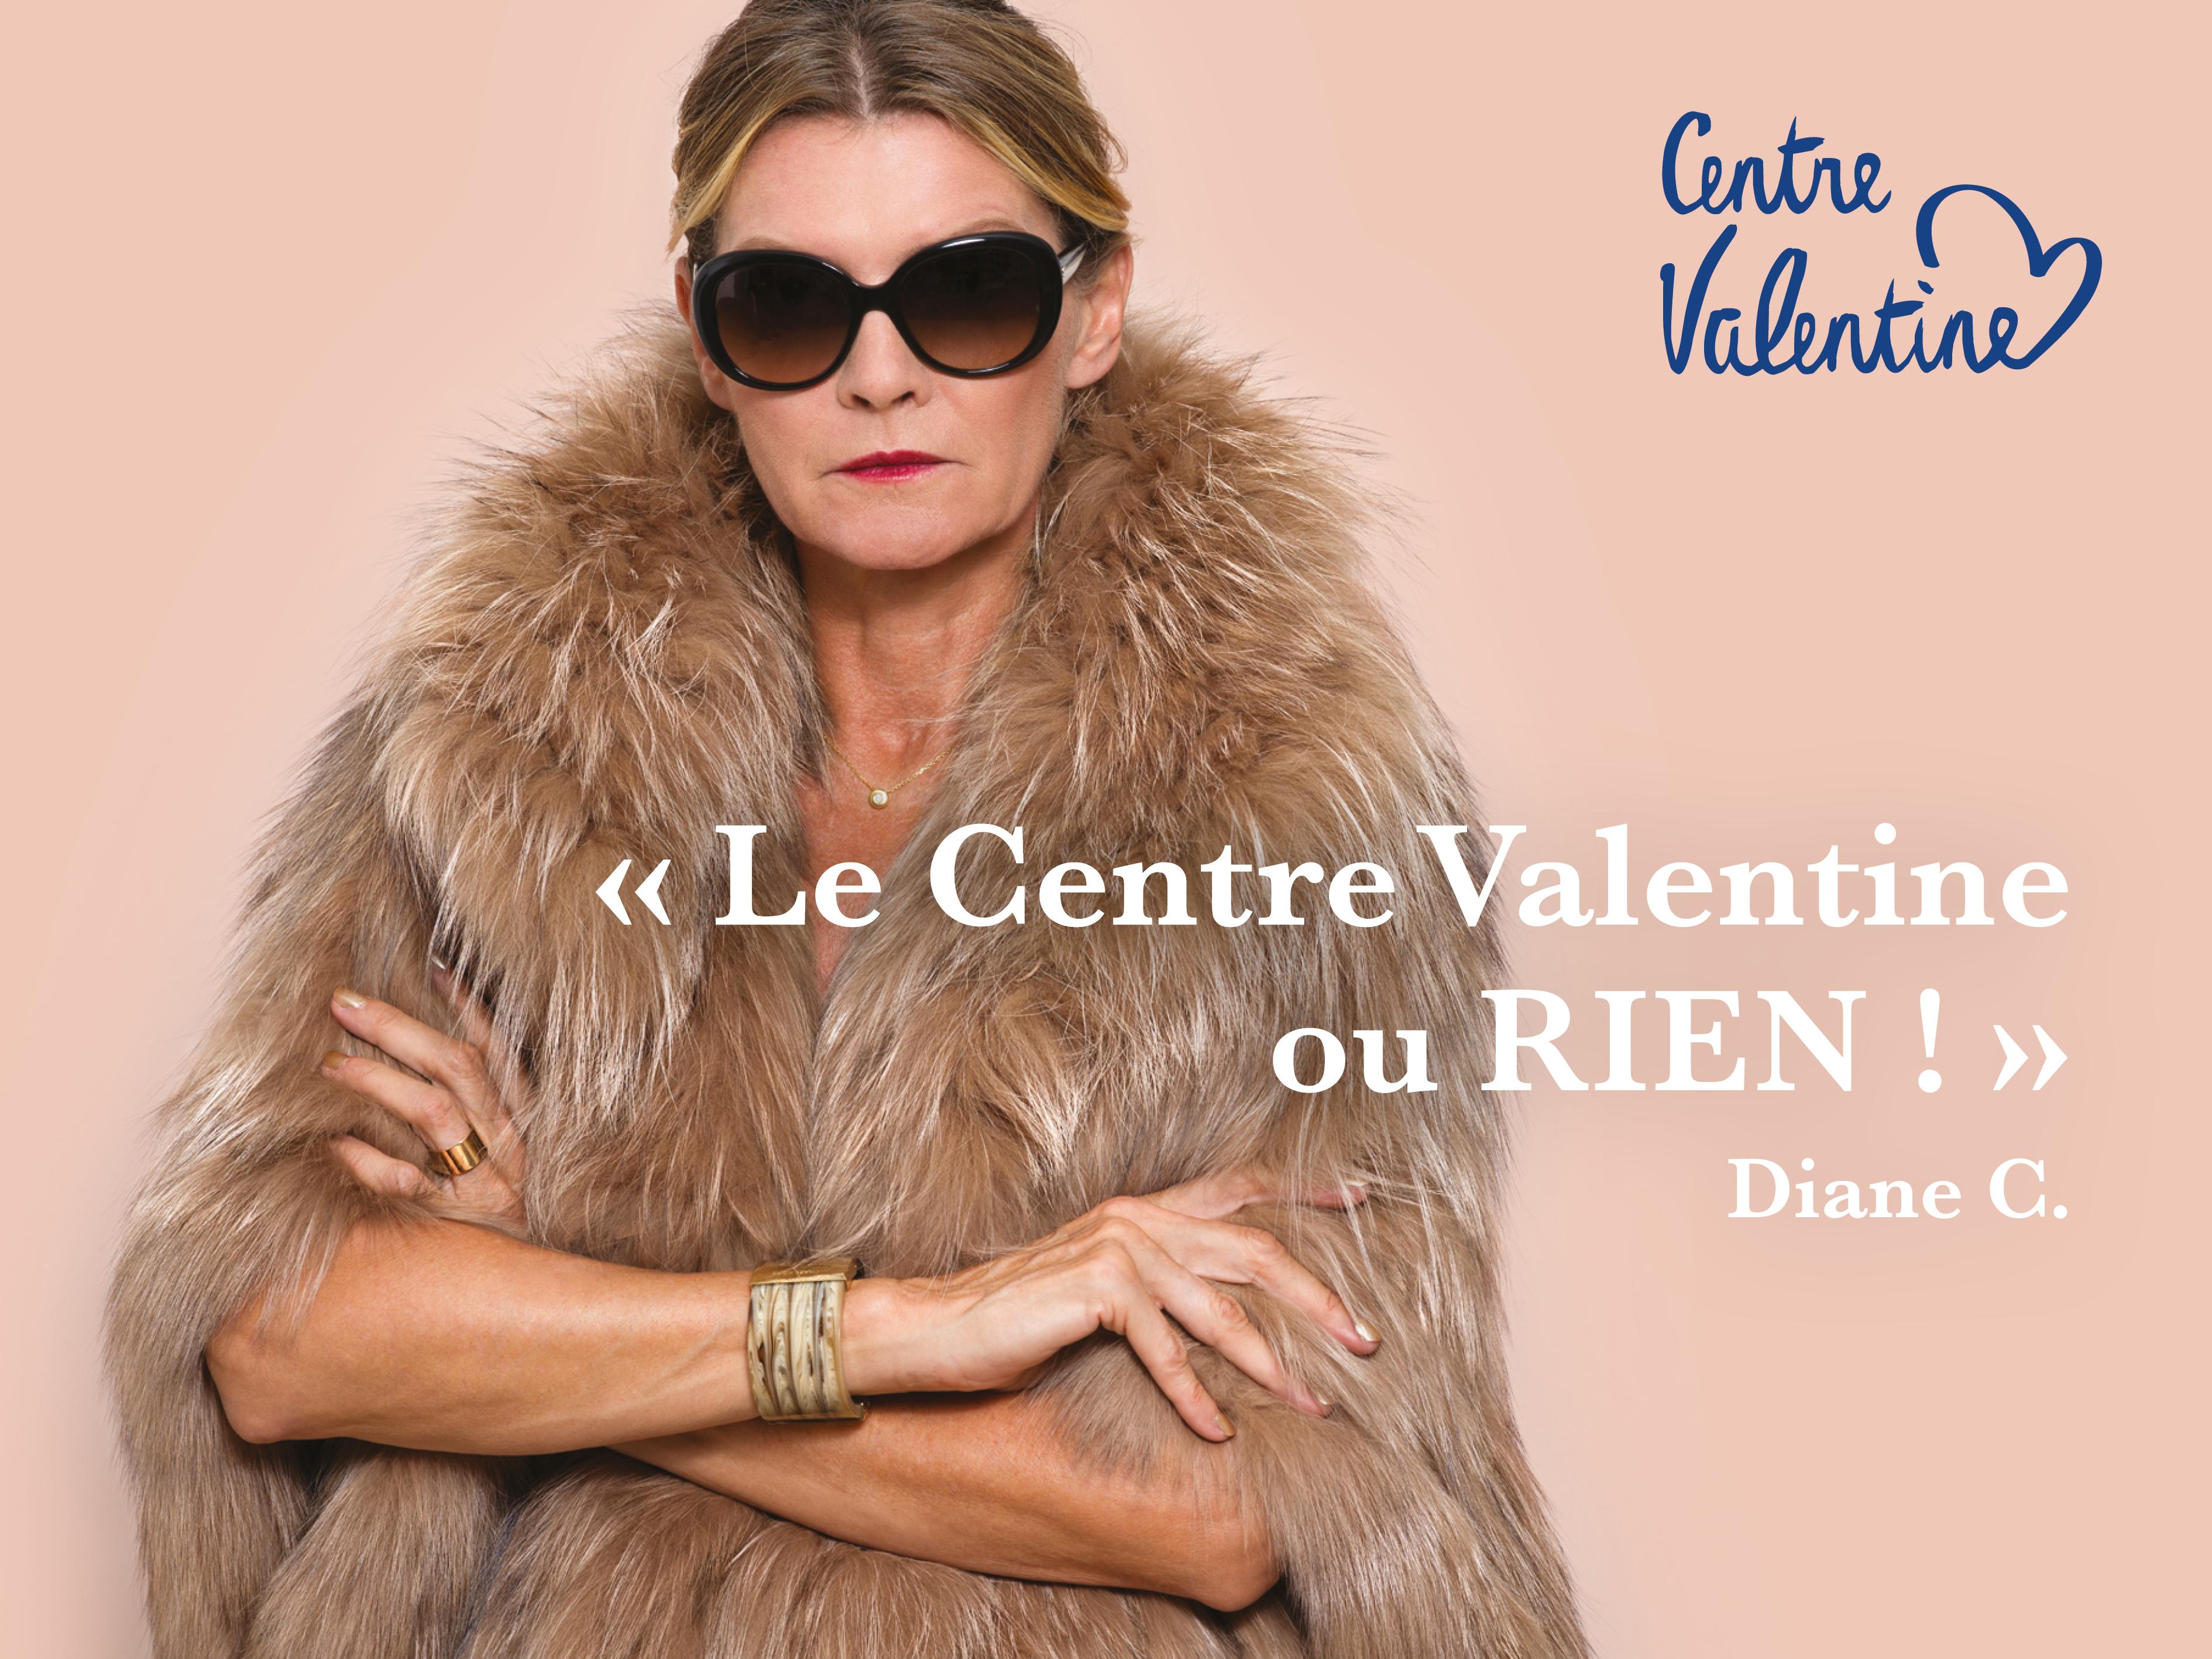 Centre Valentine